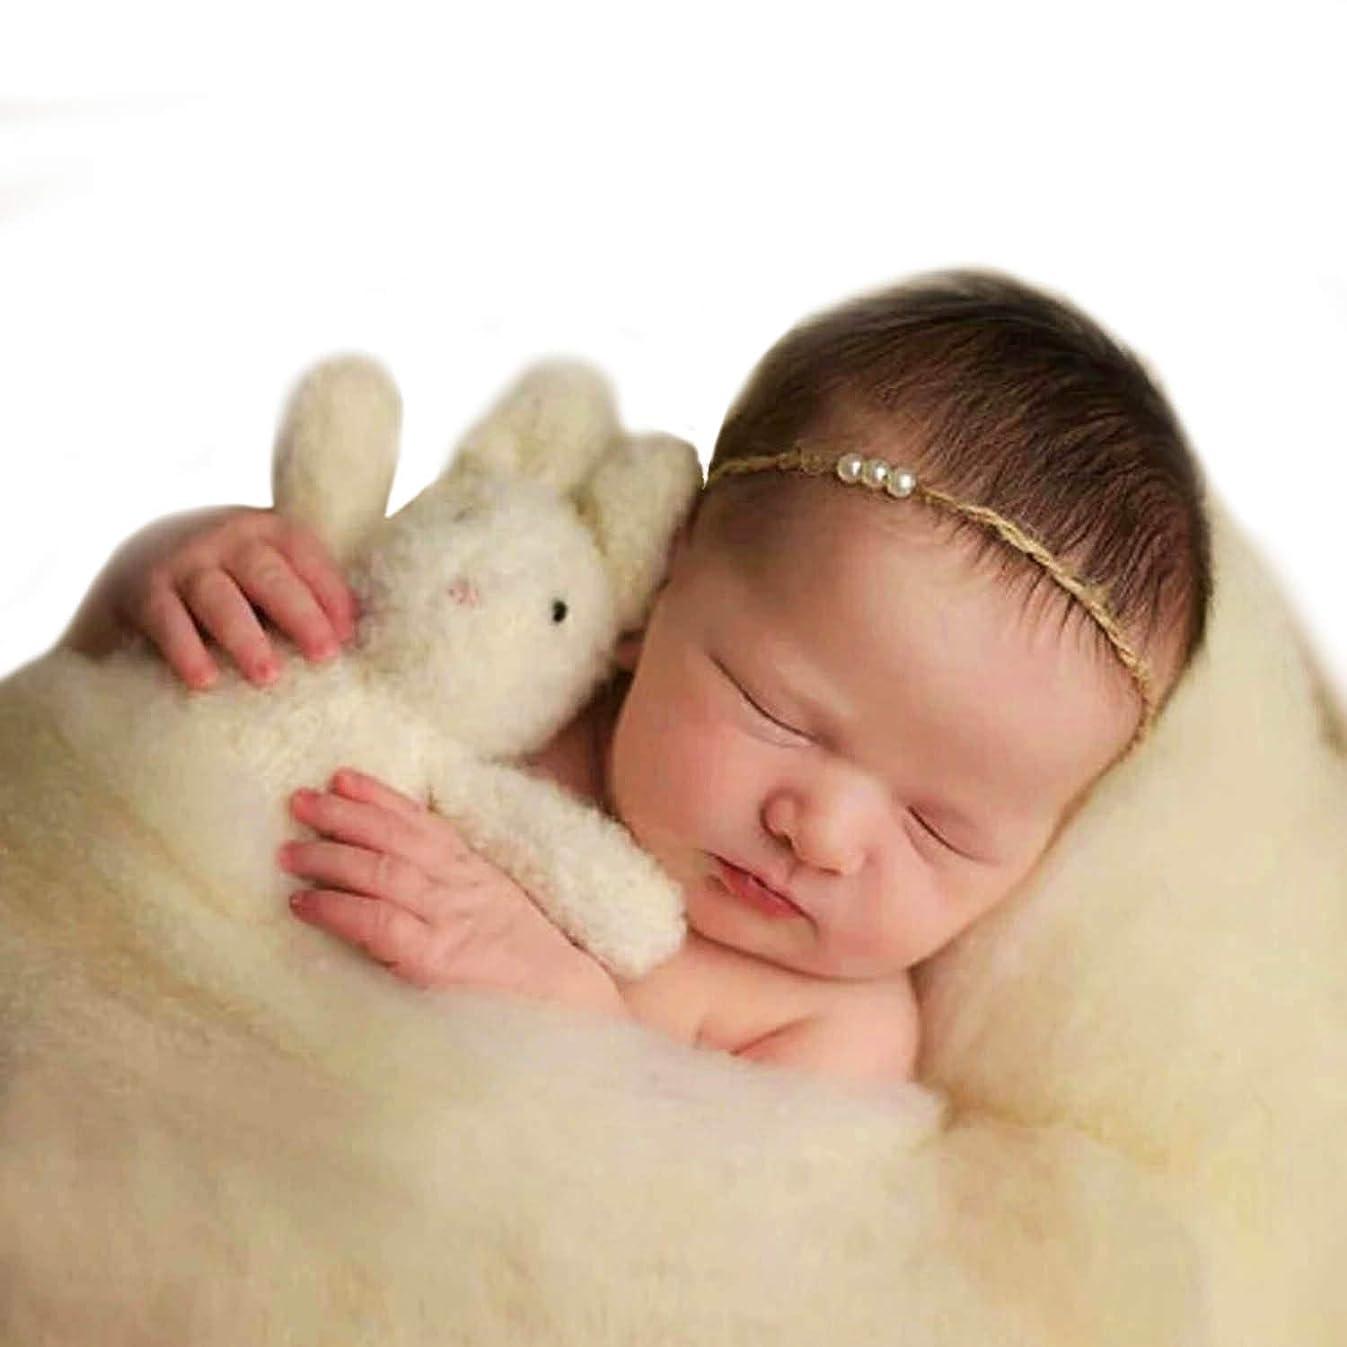 Sunmig Newborn Baby Wool Fluff Photo Props Merino Basket Stuffer Basket Filler Rug Photography Prop (Beige)